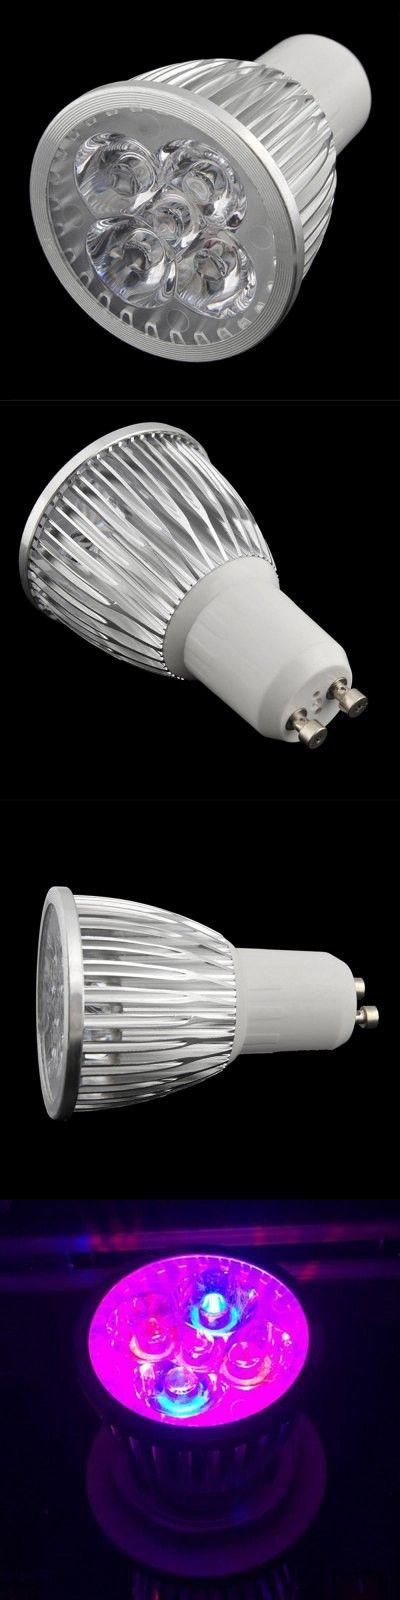 Indoor Lights | GU10 10W 5 LED Plant Grow Light Hydroponics Lighting